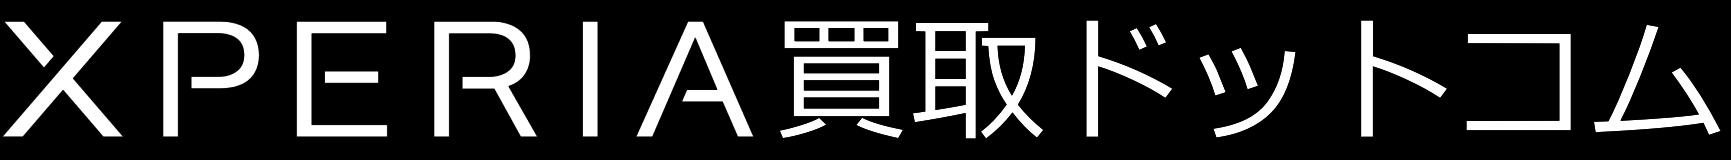 Xperia買取ドットコム-中古・壊れたXperia買取(エクスペリア)高価買取専門店,福岡博多,SIMフリー,docomo,au,SoftBank,スマホ,タブレット,全国送料無料宅配買取